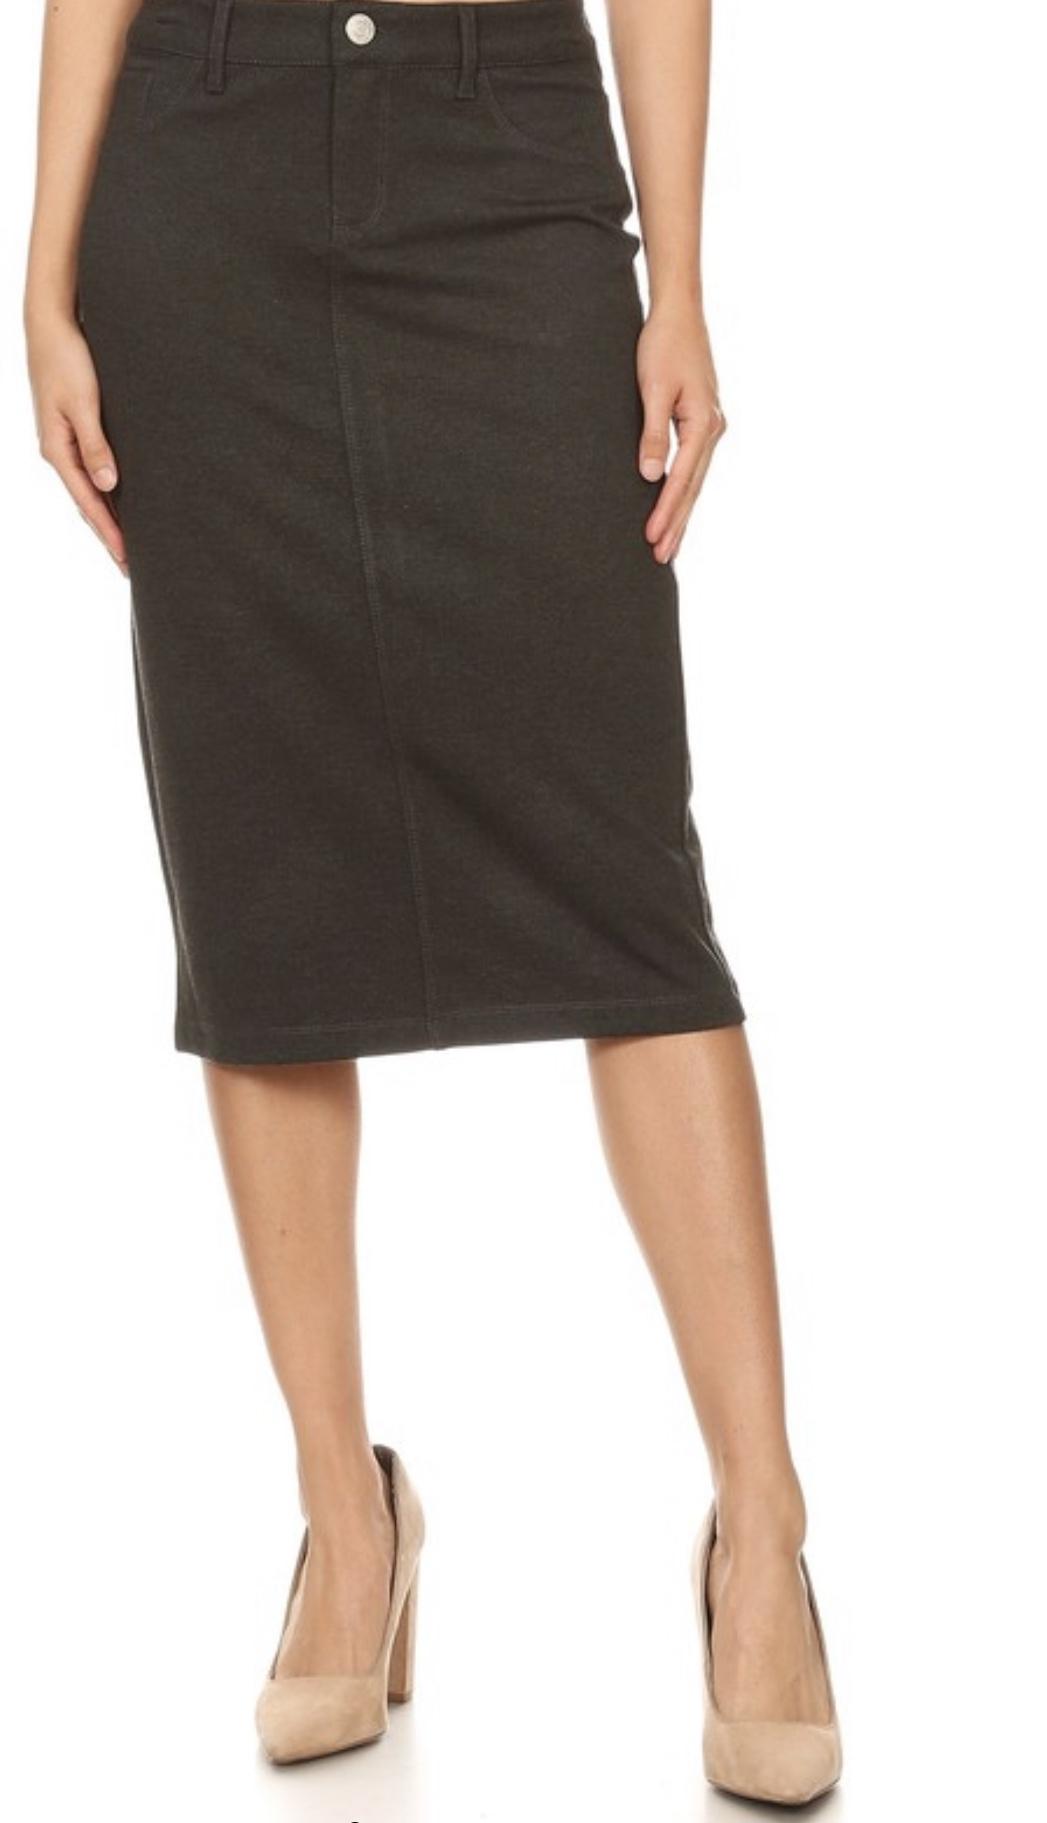 Heather Gray twill stretch pencil skirt